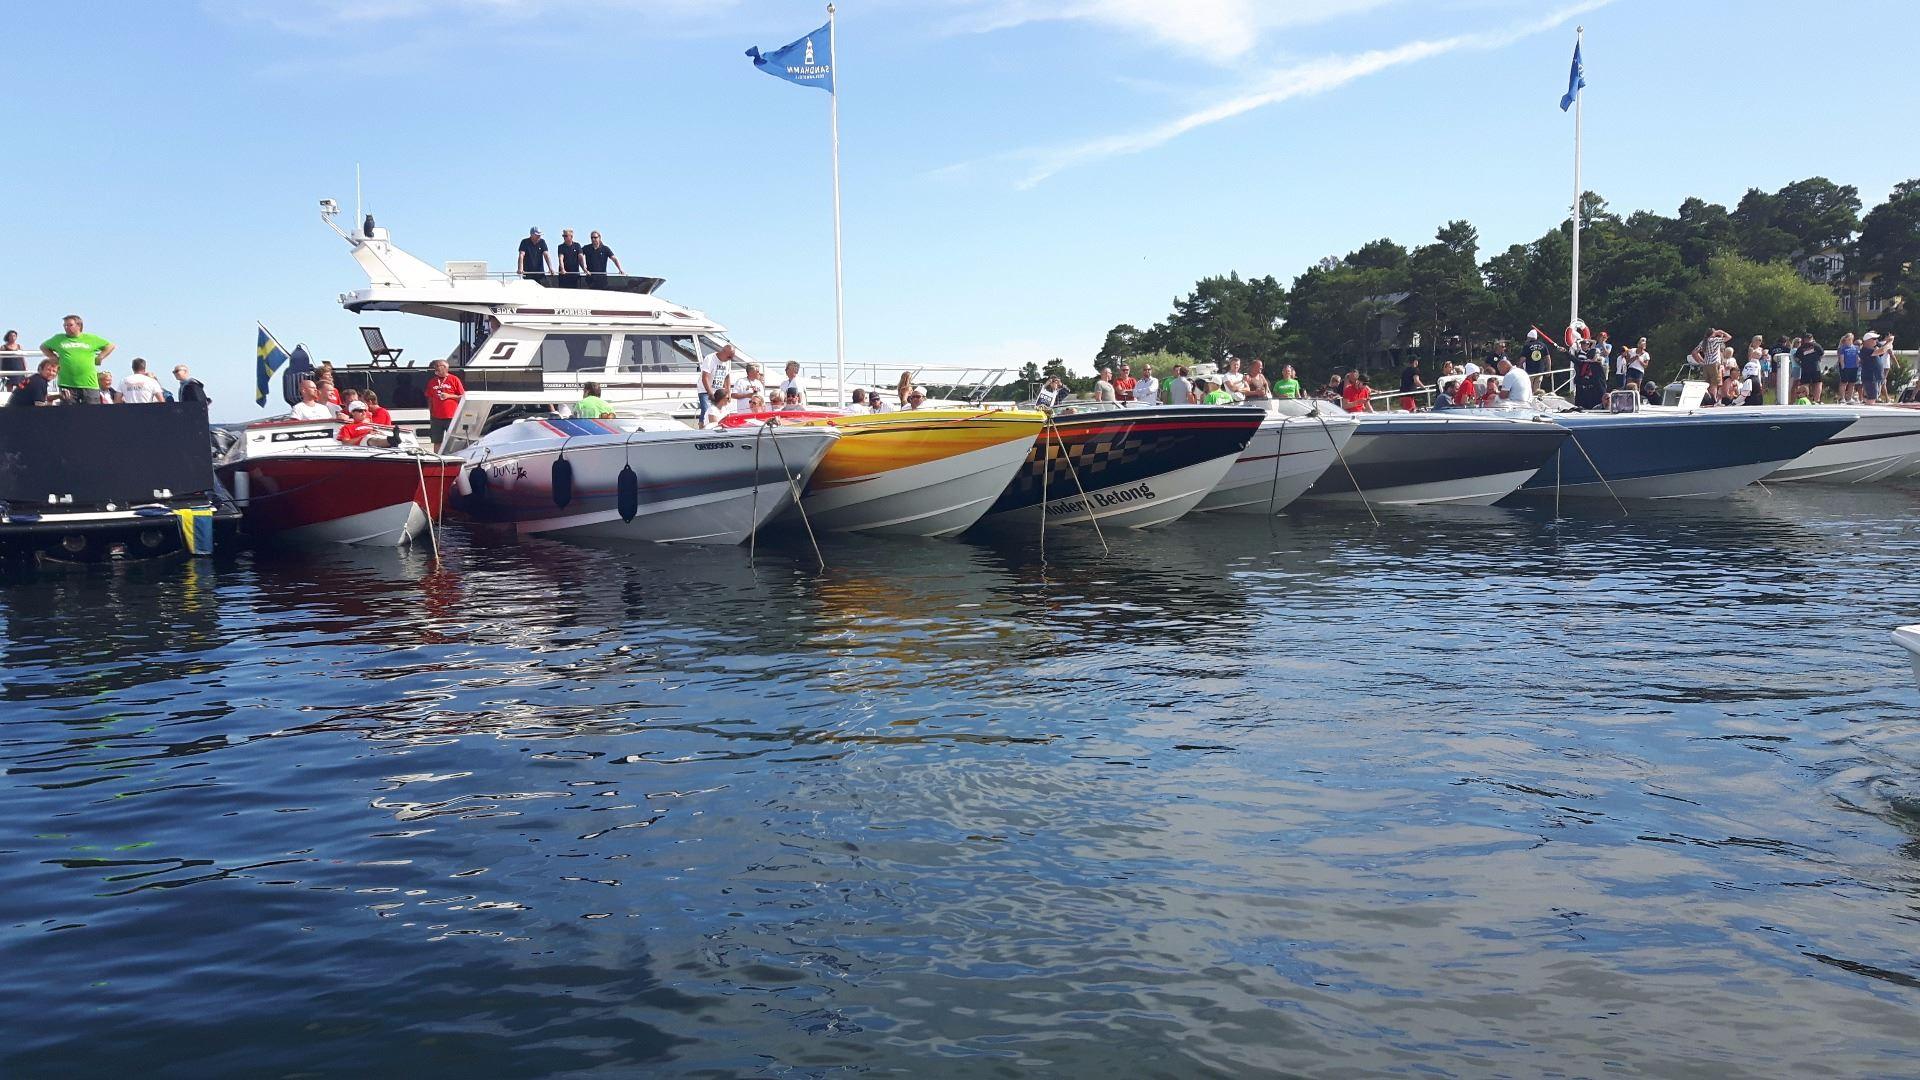 Poker Run in the eastern harbor of Mariehamn